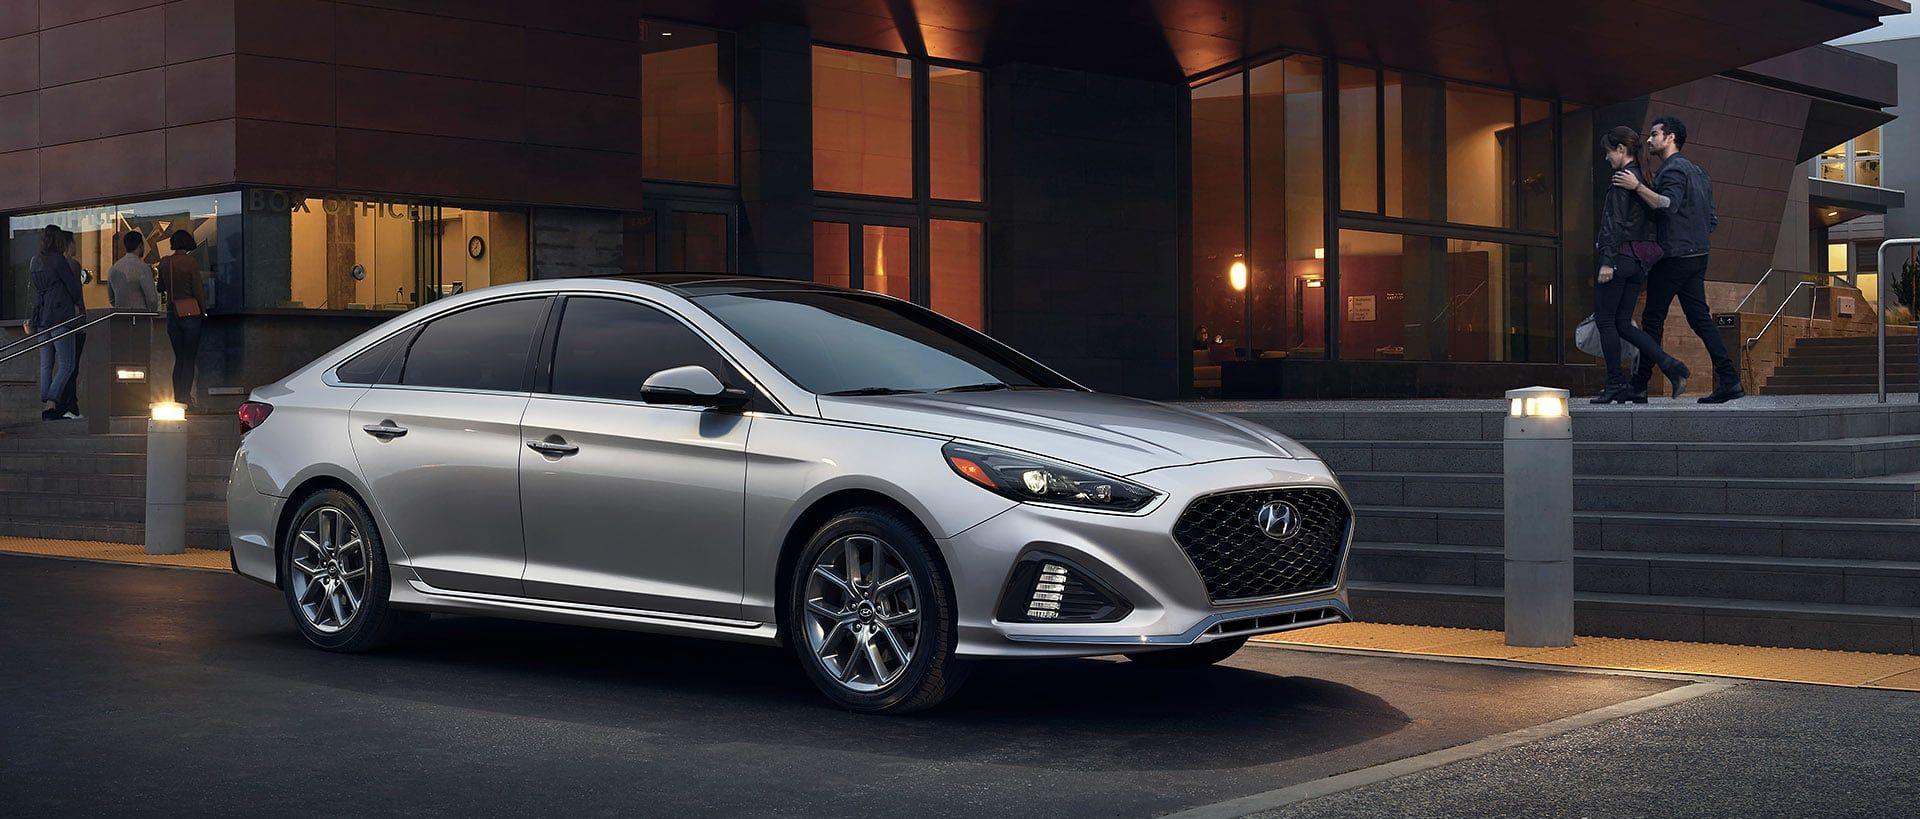 2019 Hyundai Sonata Leasing near Woodbridge, VA - Pohanka